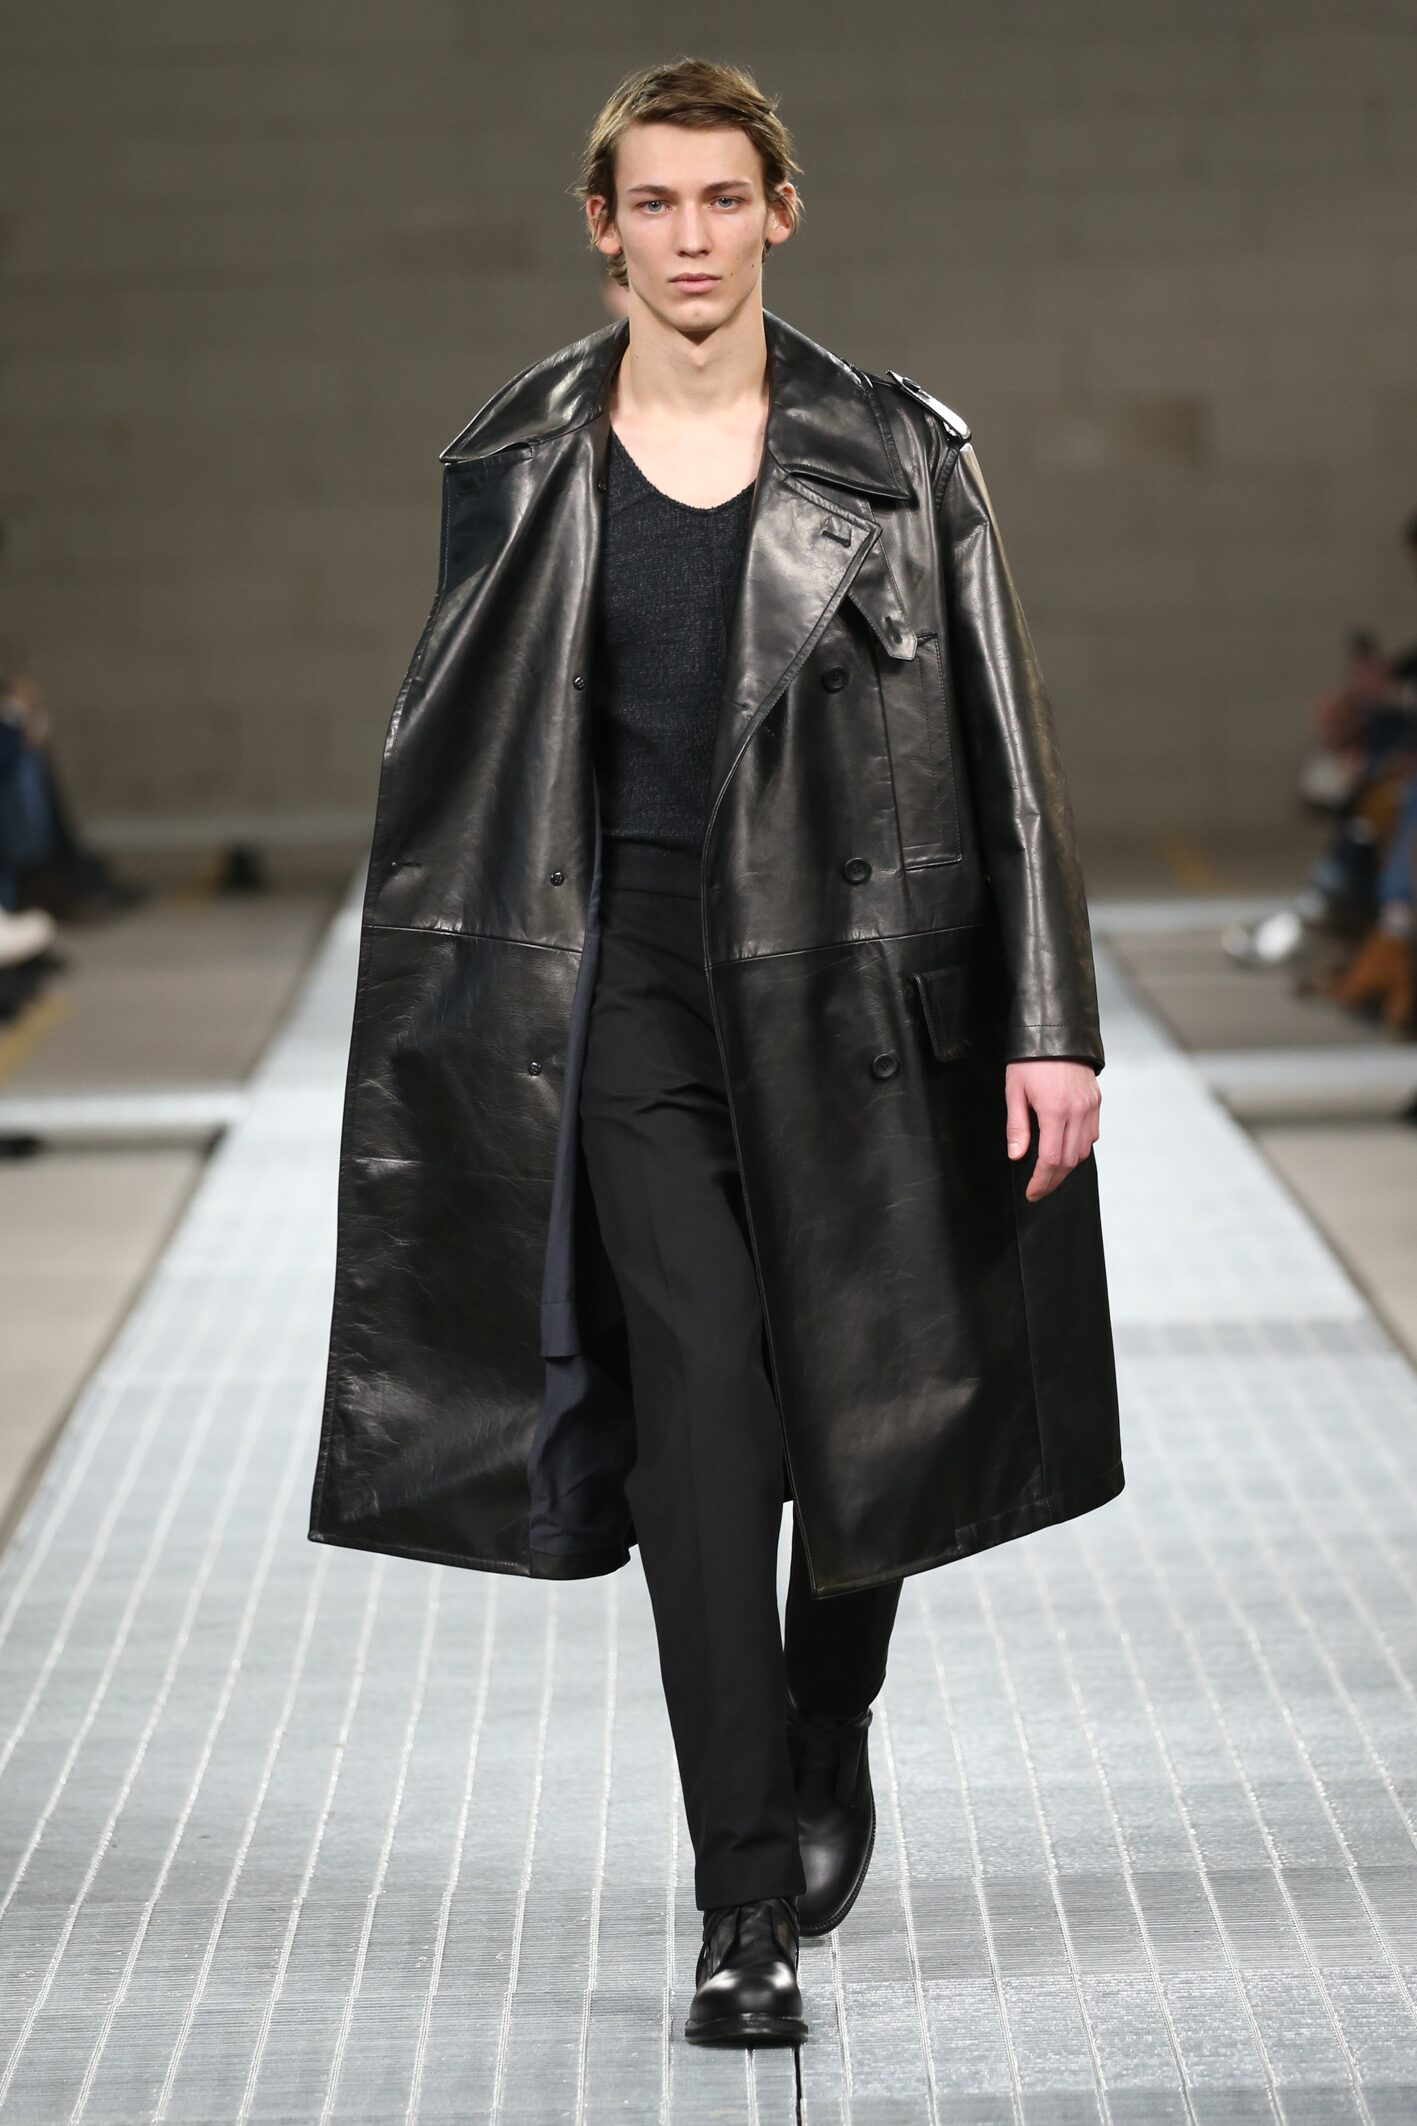 Dirk Bikkembergs Fashion Show FW 2017